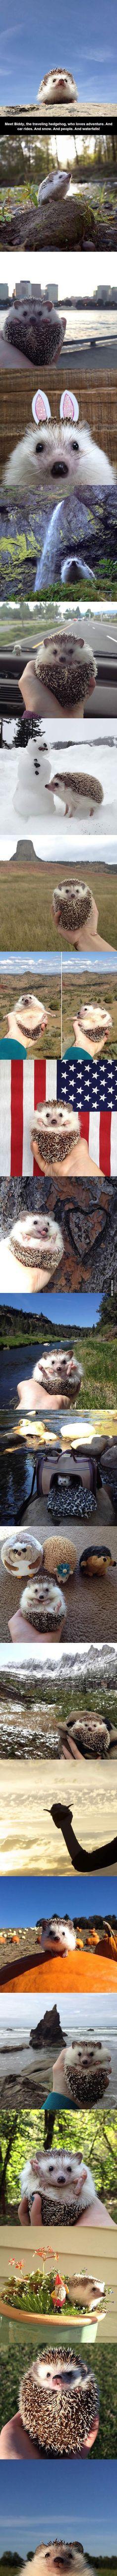 Adventures of Biddy The Hedgehog.